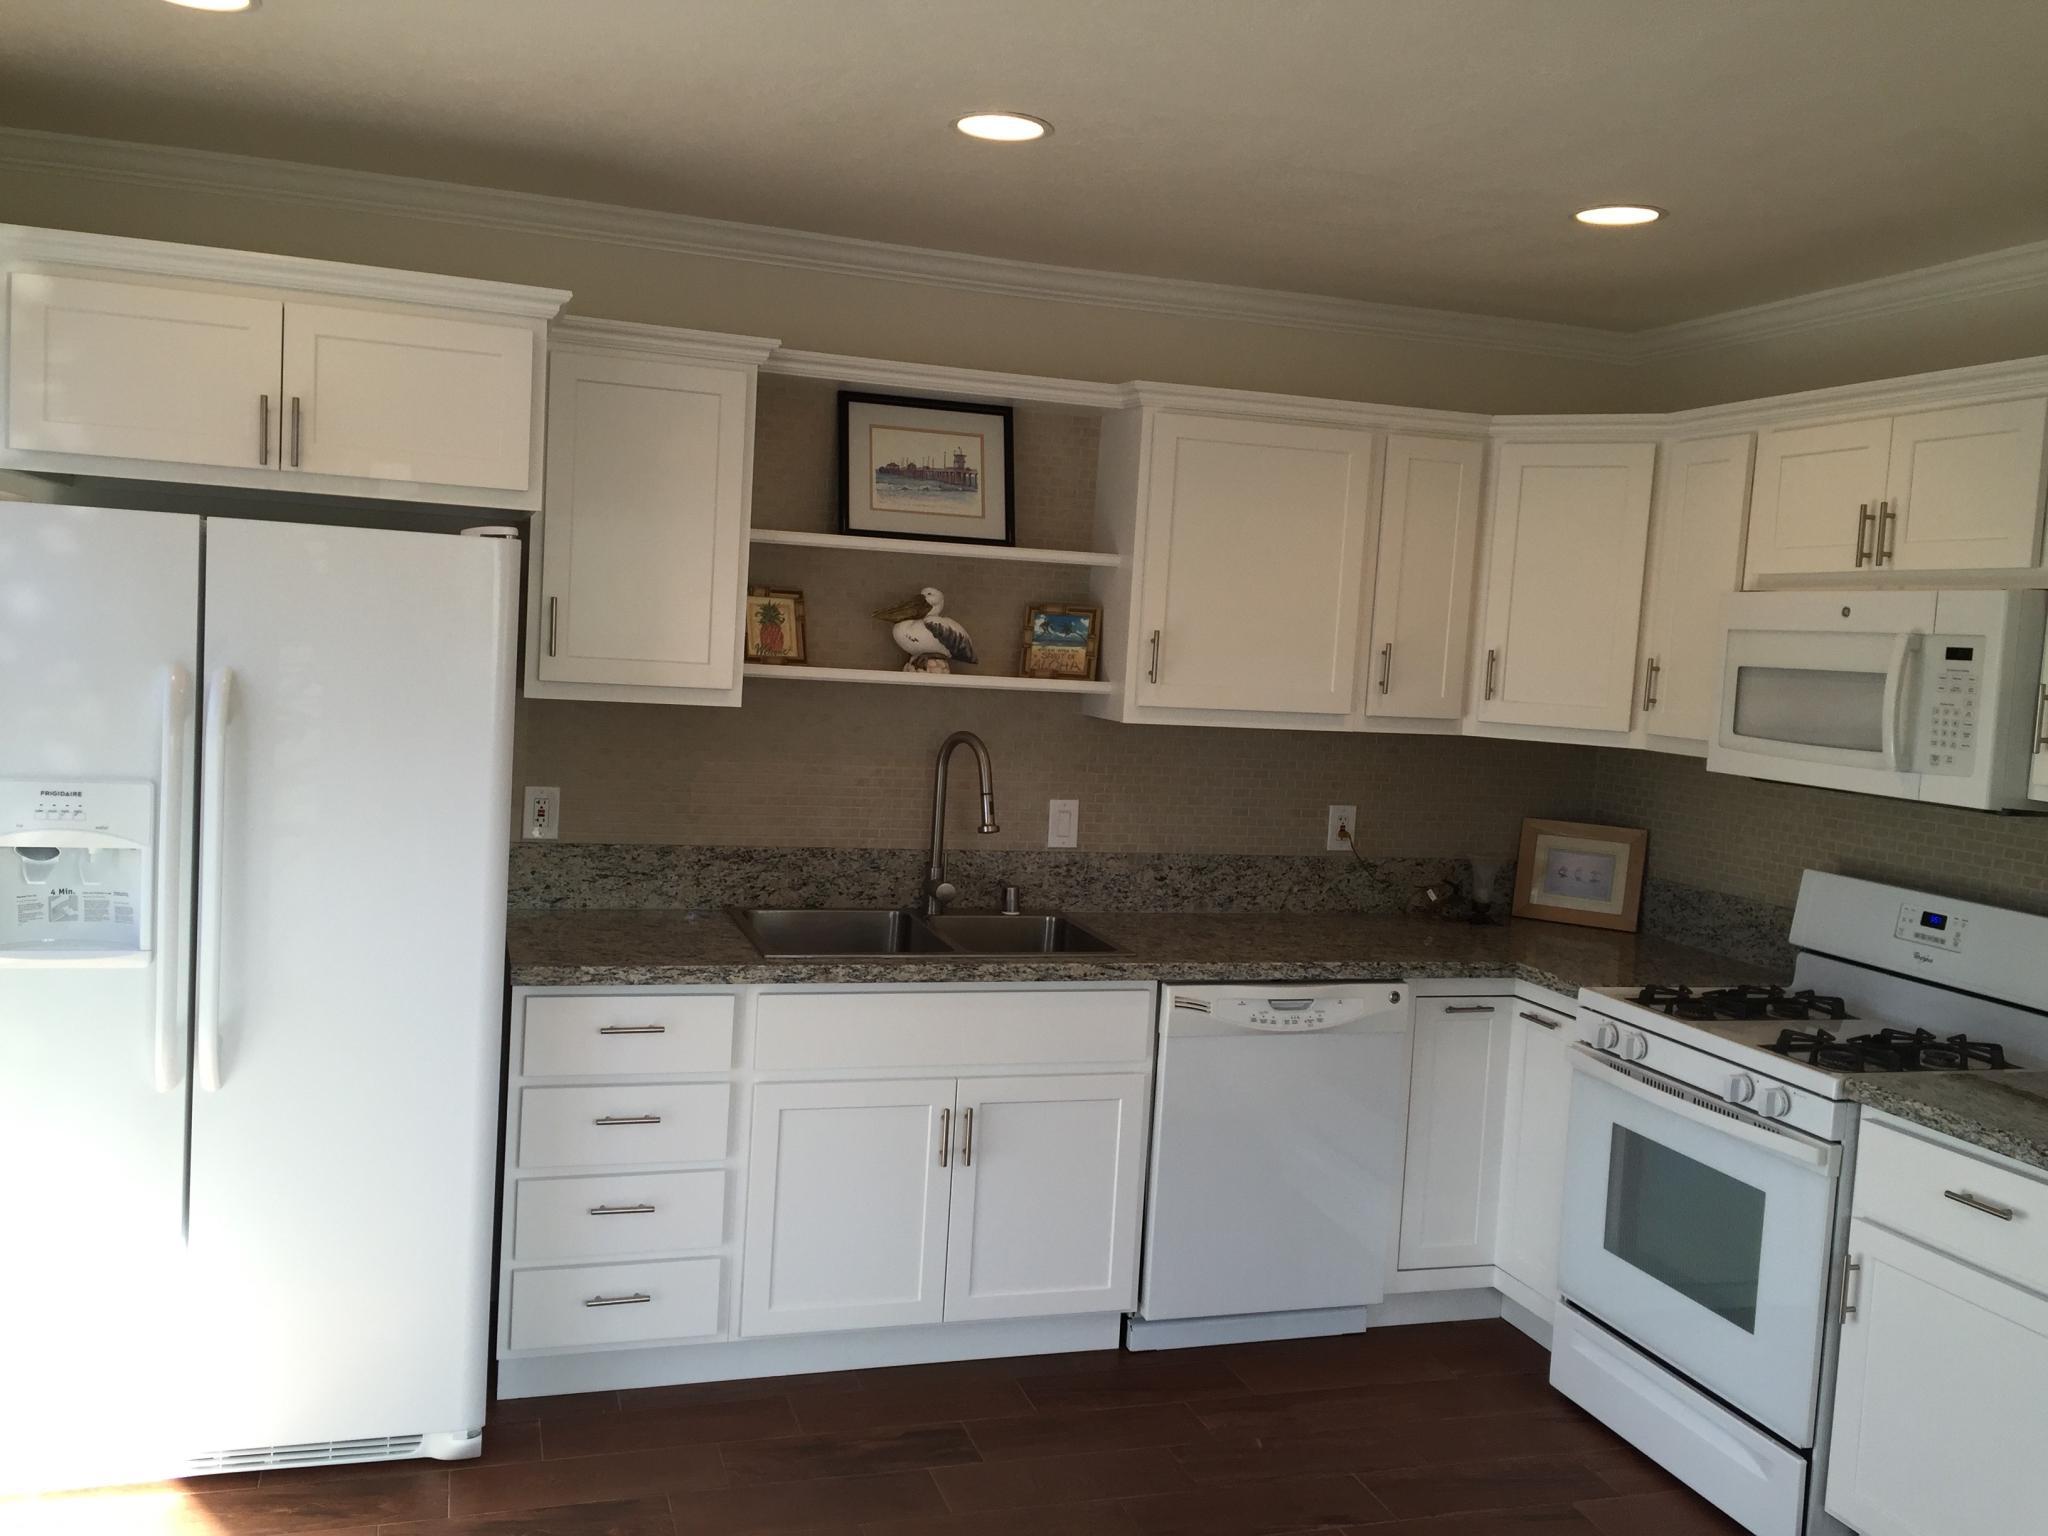 820 Alabama St For Rent - Huntington Beach, CA | Trulia